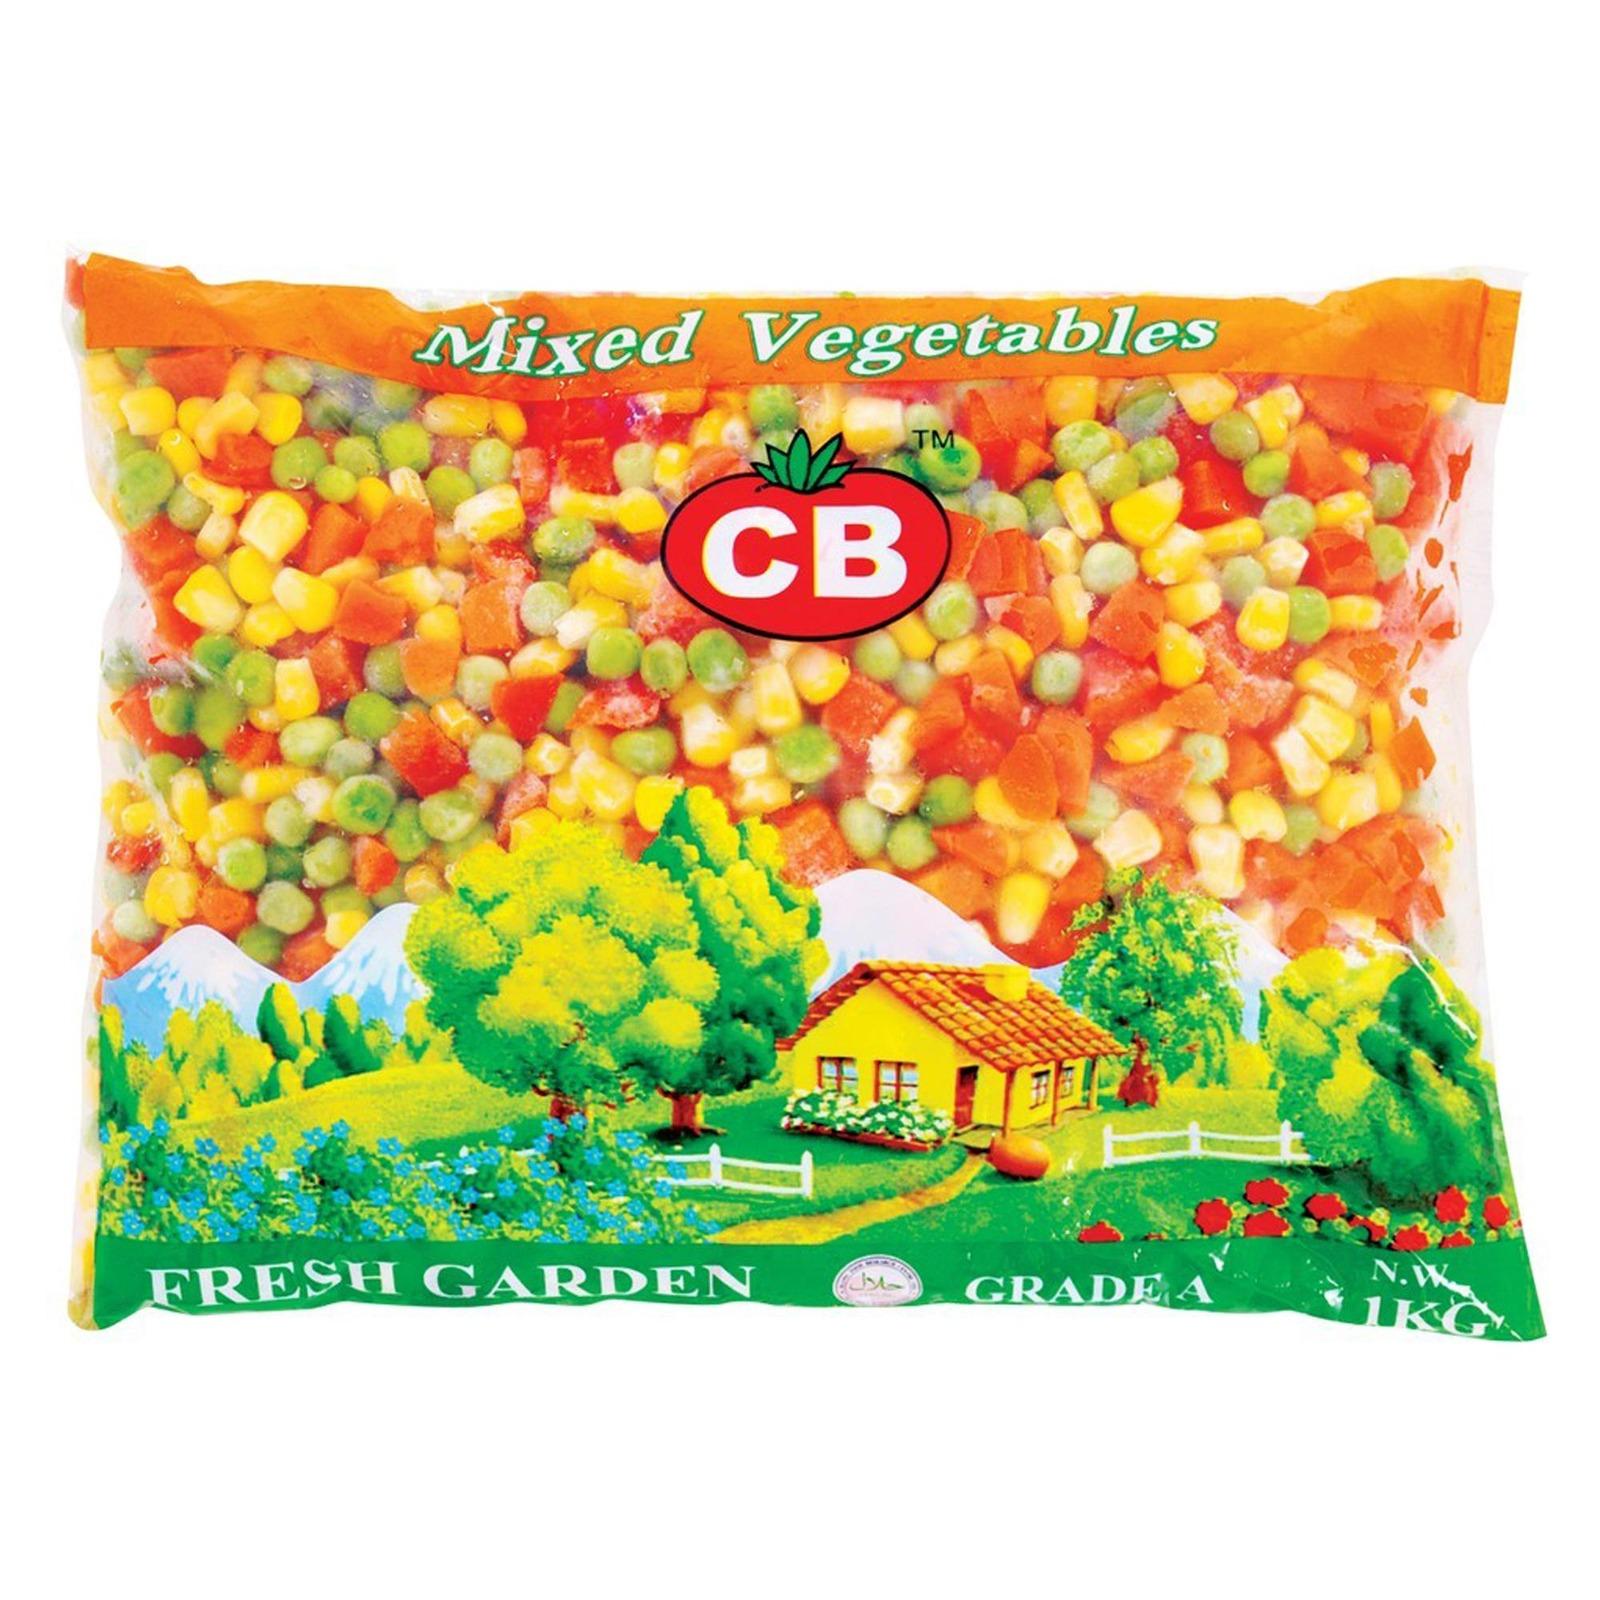 CB Mixed Vegetables